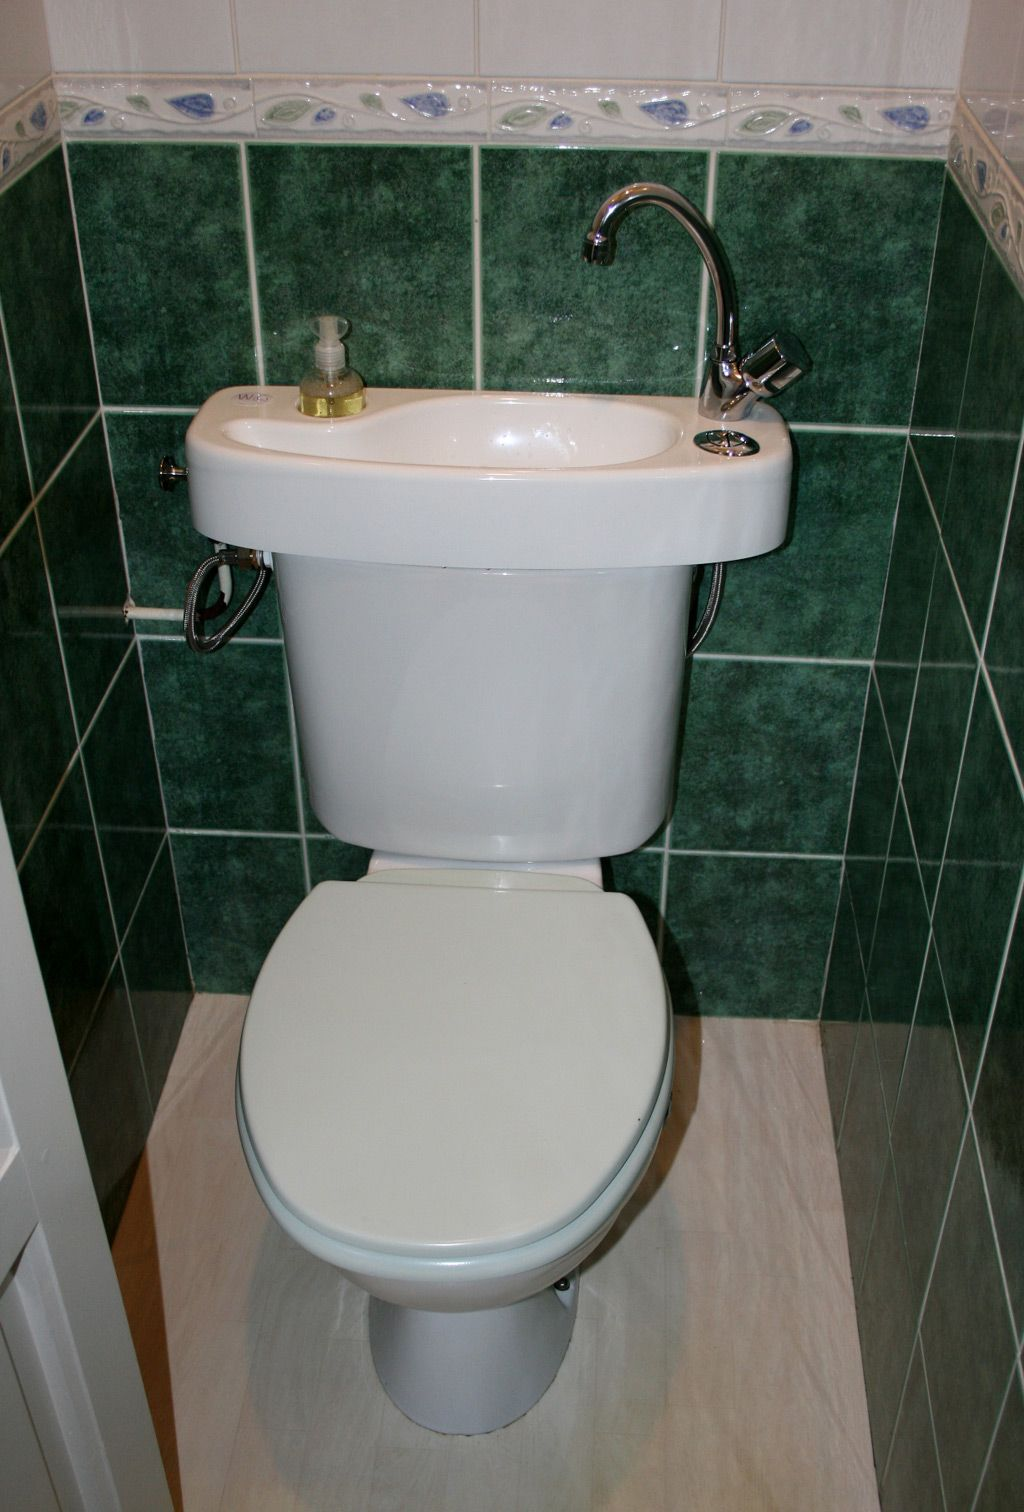 afbeeldingsresultaat voor wc lavabo wc pinterest searching. Black Bedroom Furniture Sets. Home Design Ideas